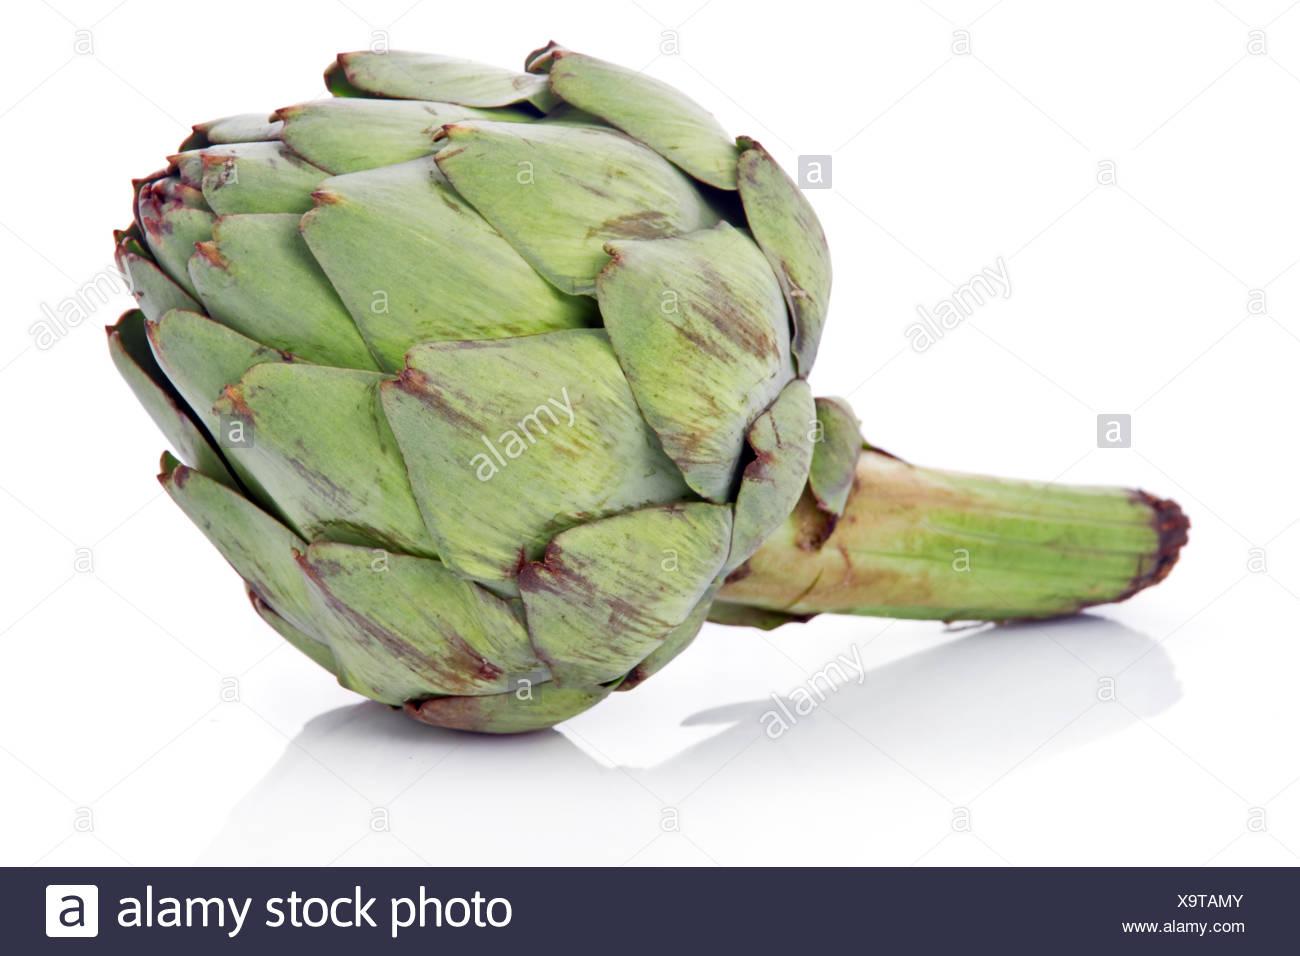 Ripe green artichoke vegetable isolated - Stock Image